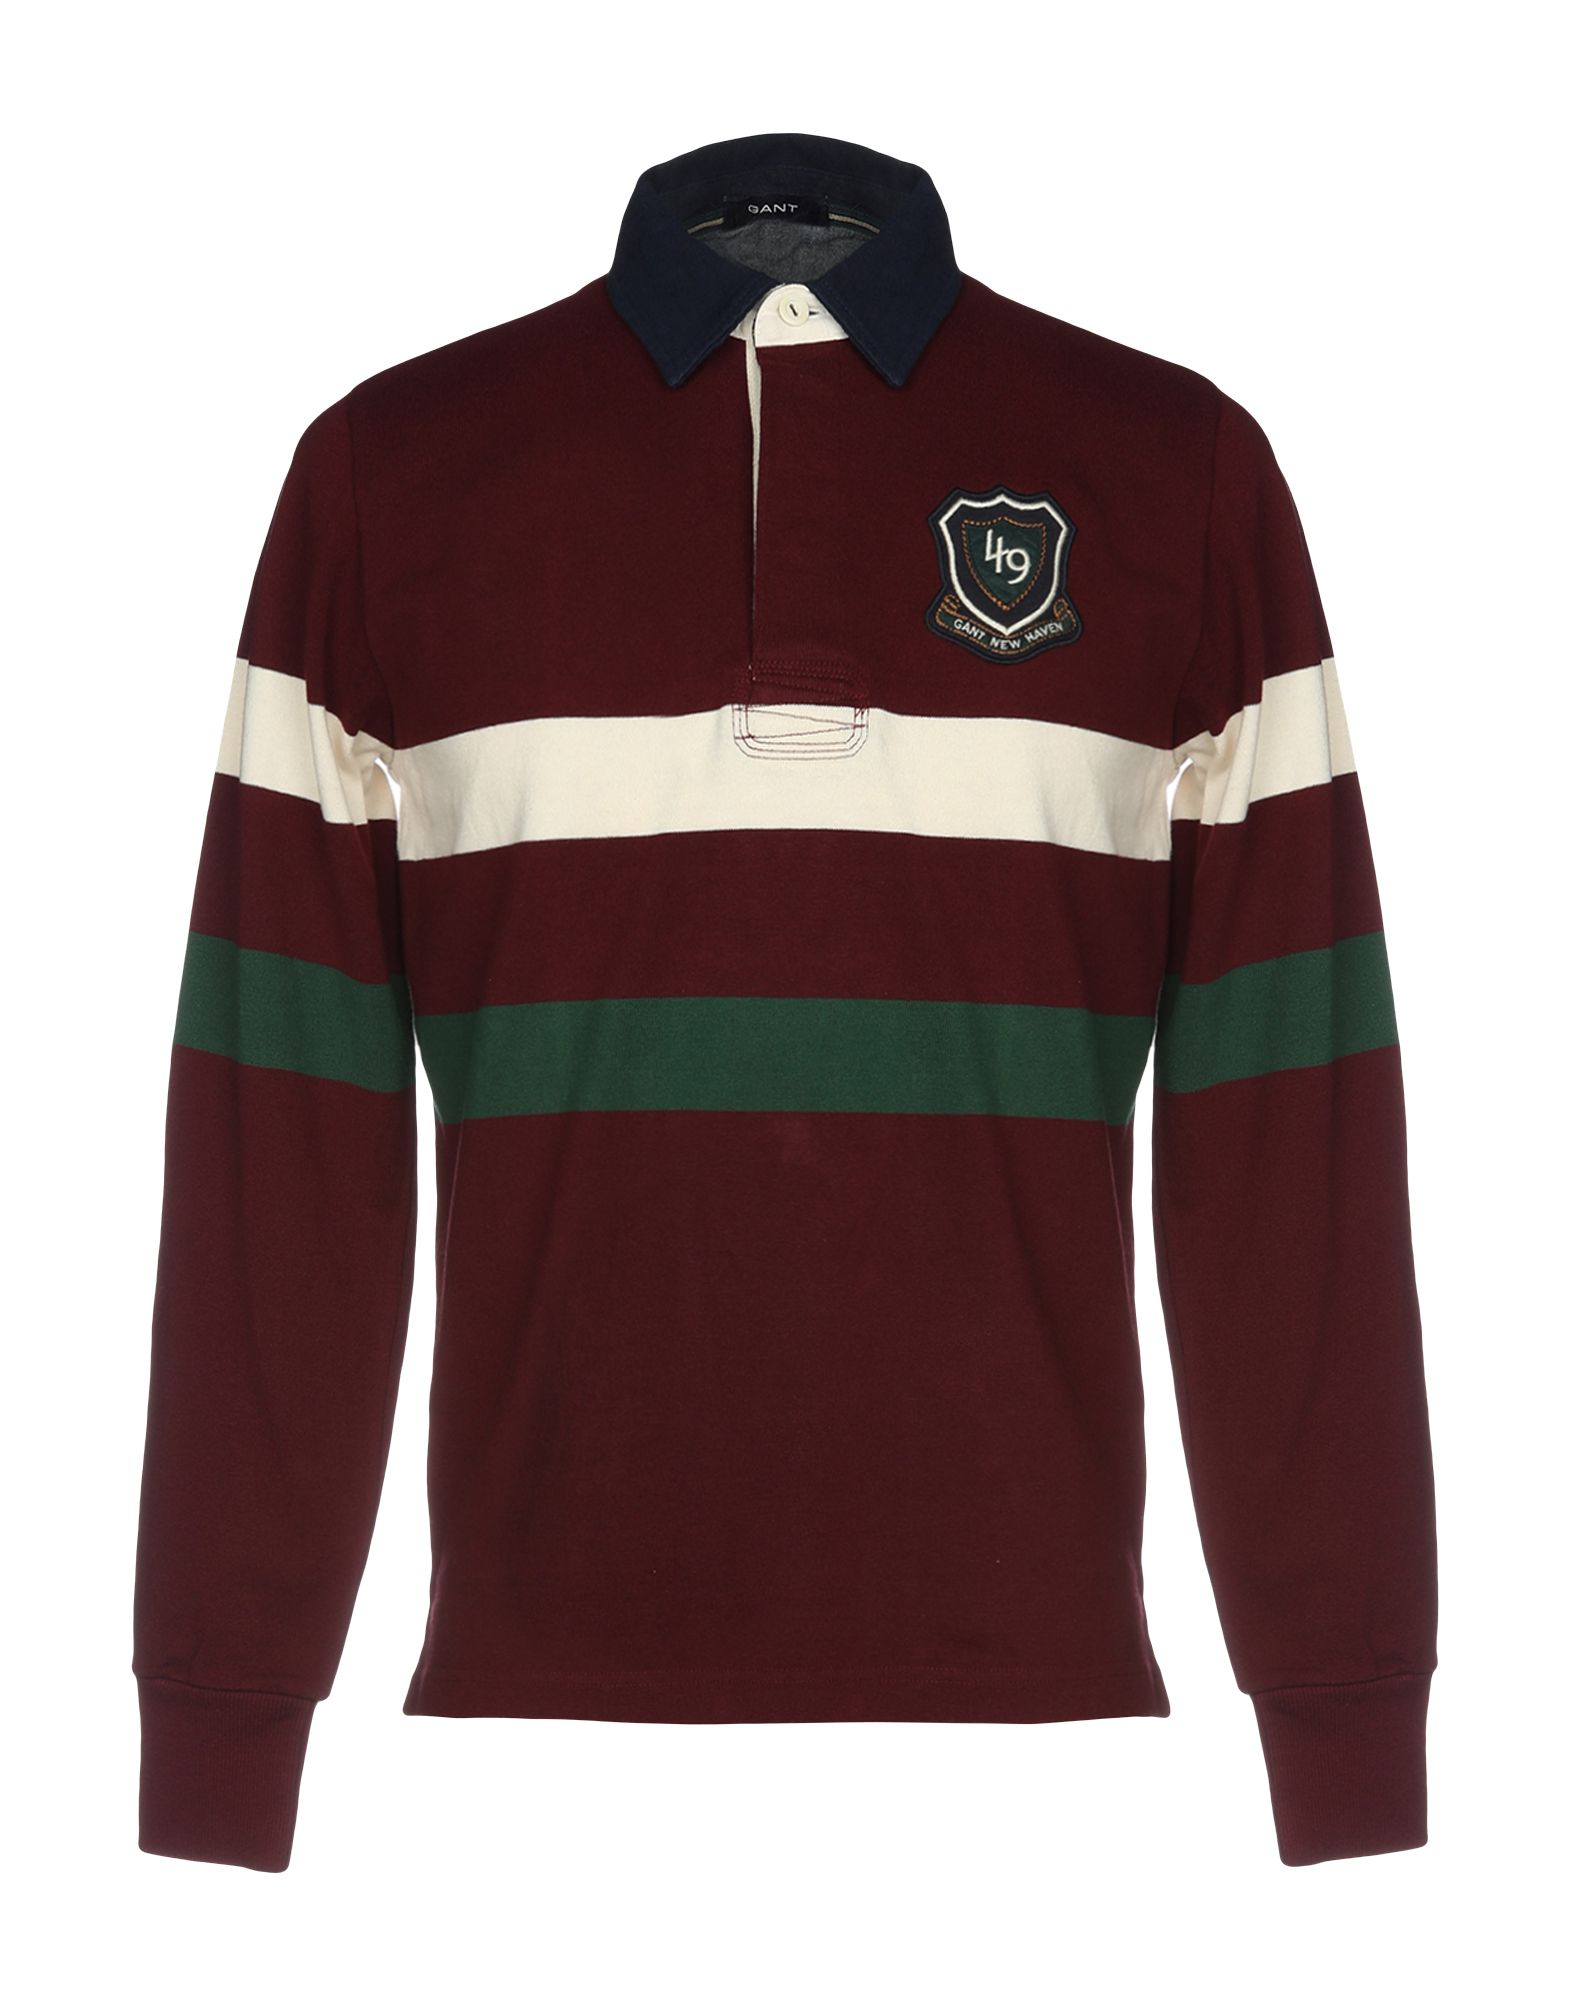 f1869348588c Μπλουζάκι Polo Gant Άνδρας - Μπλουζάκια Polo Gant στο YOOX - 12236758